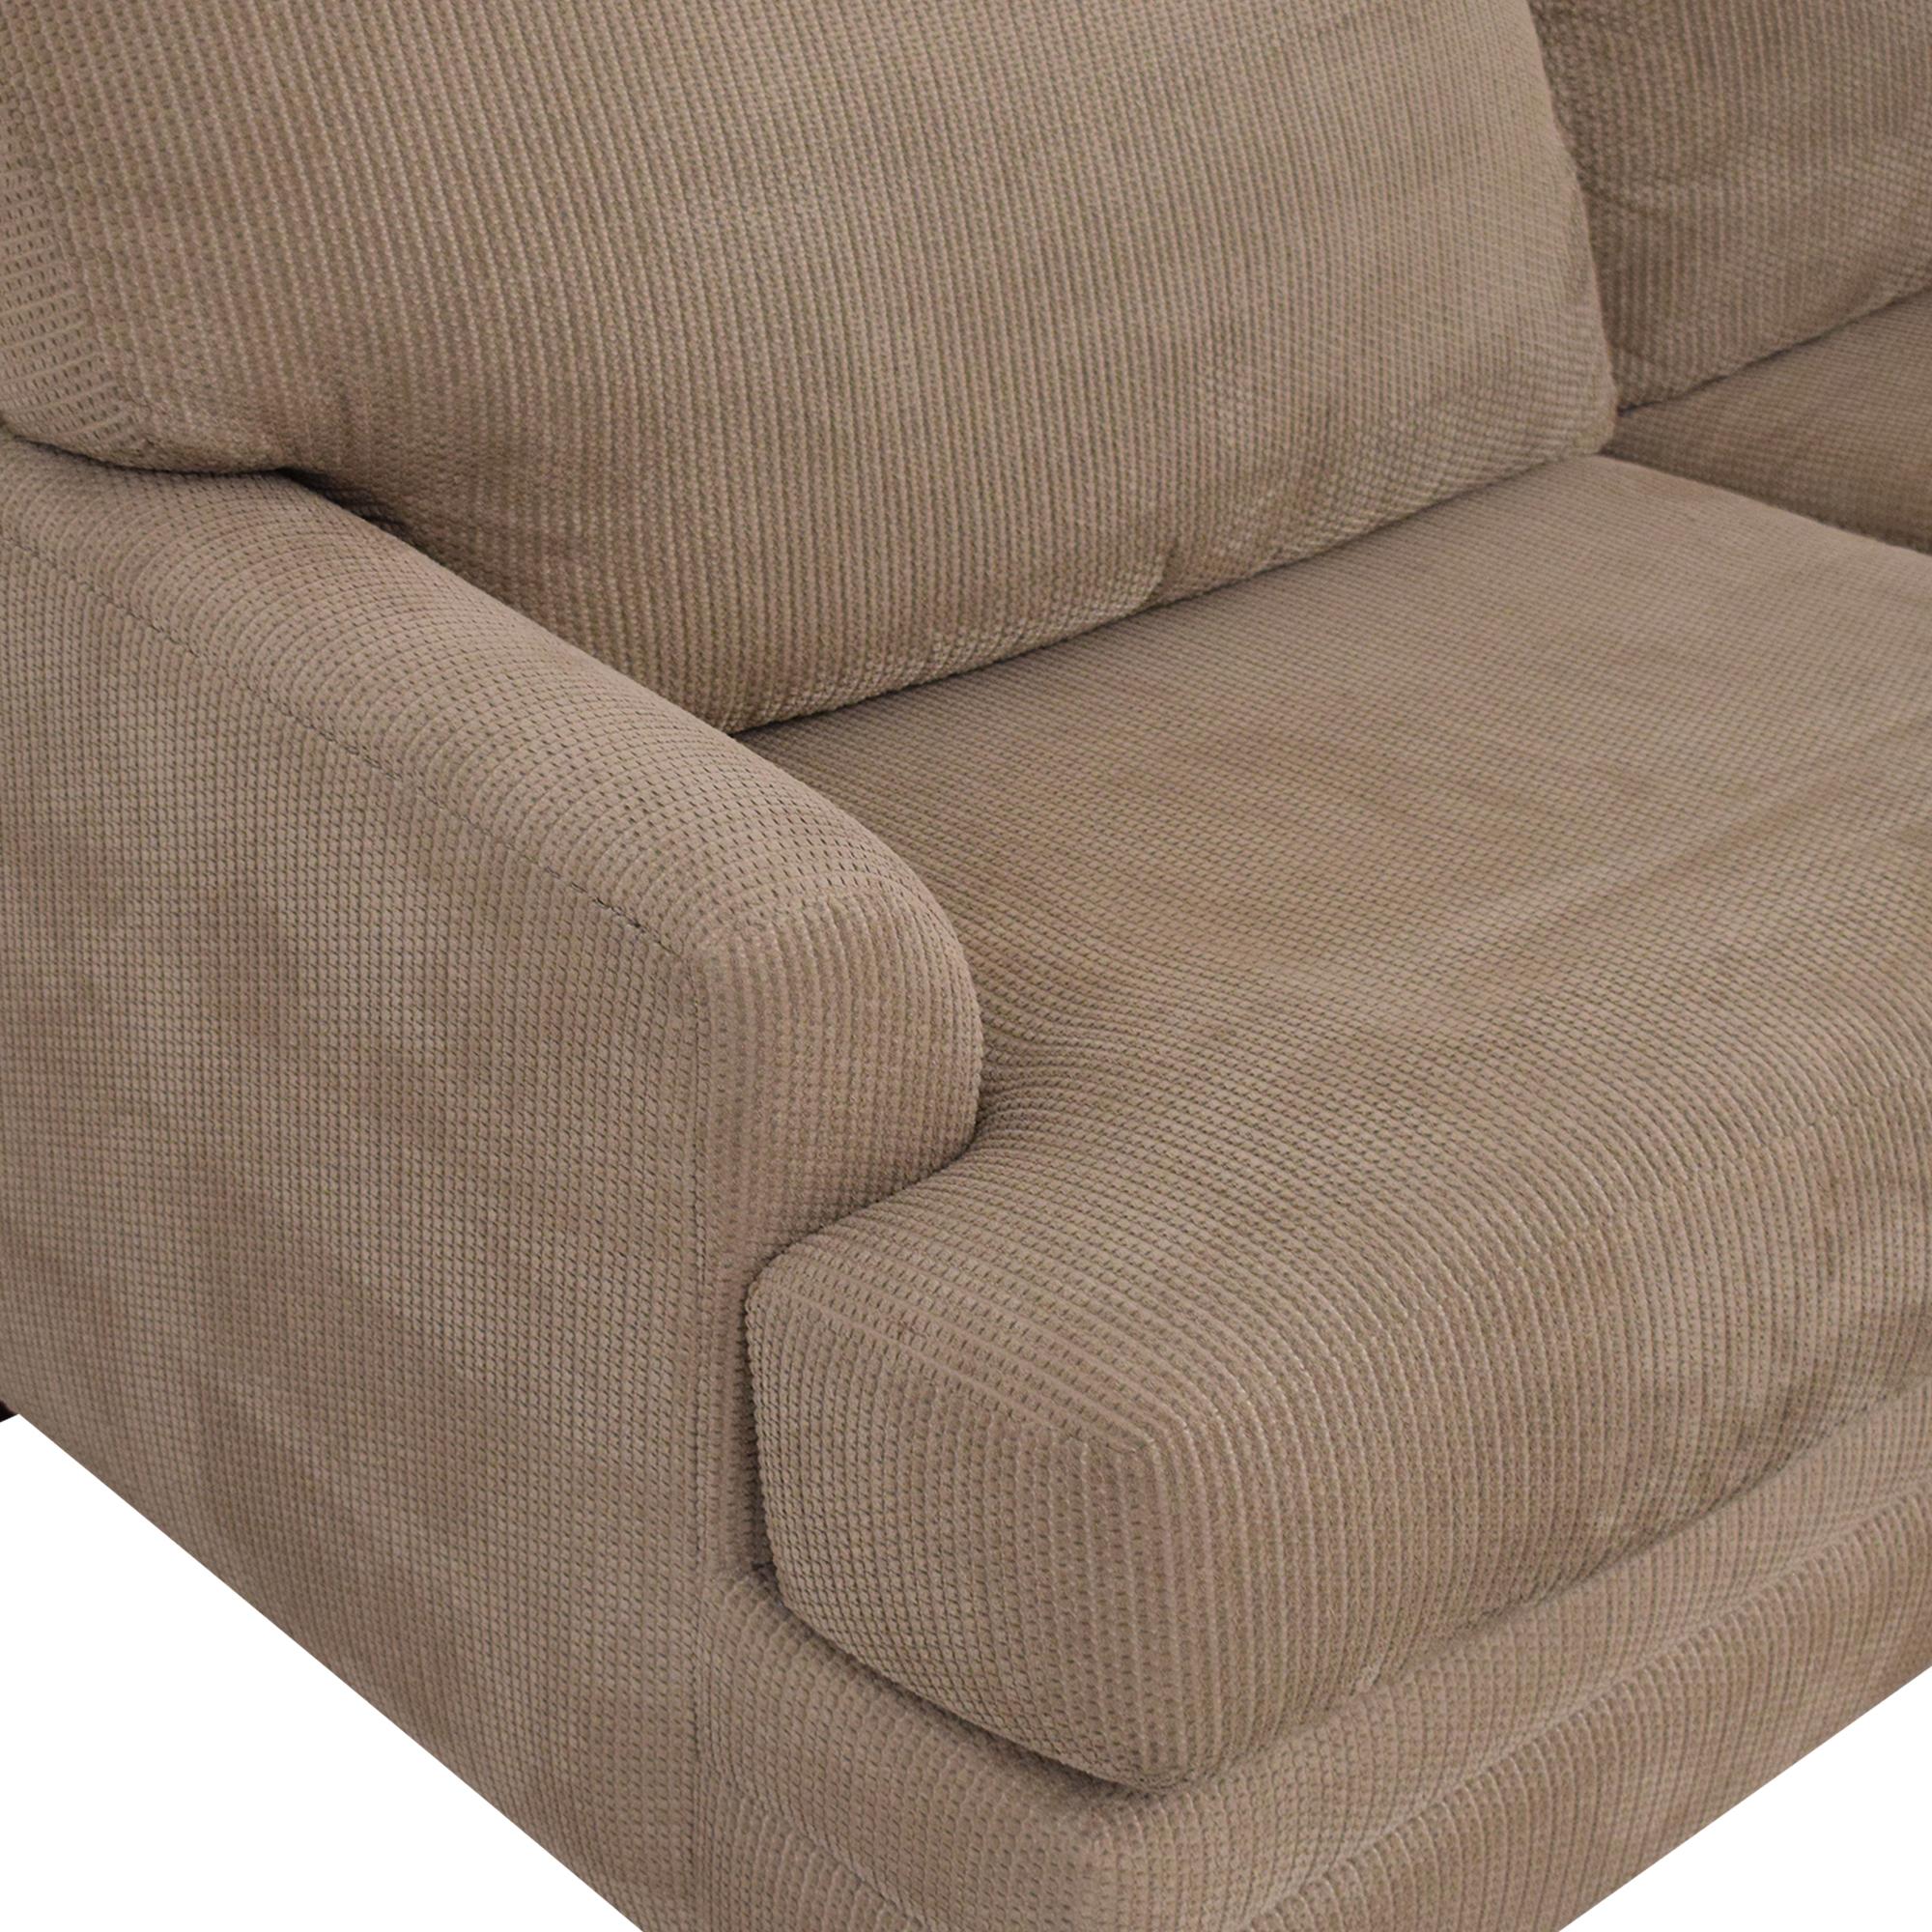 buy Bassett CU.2 Full Sleeper Sofa Bassett Furniture Sofa Beds